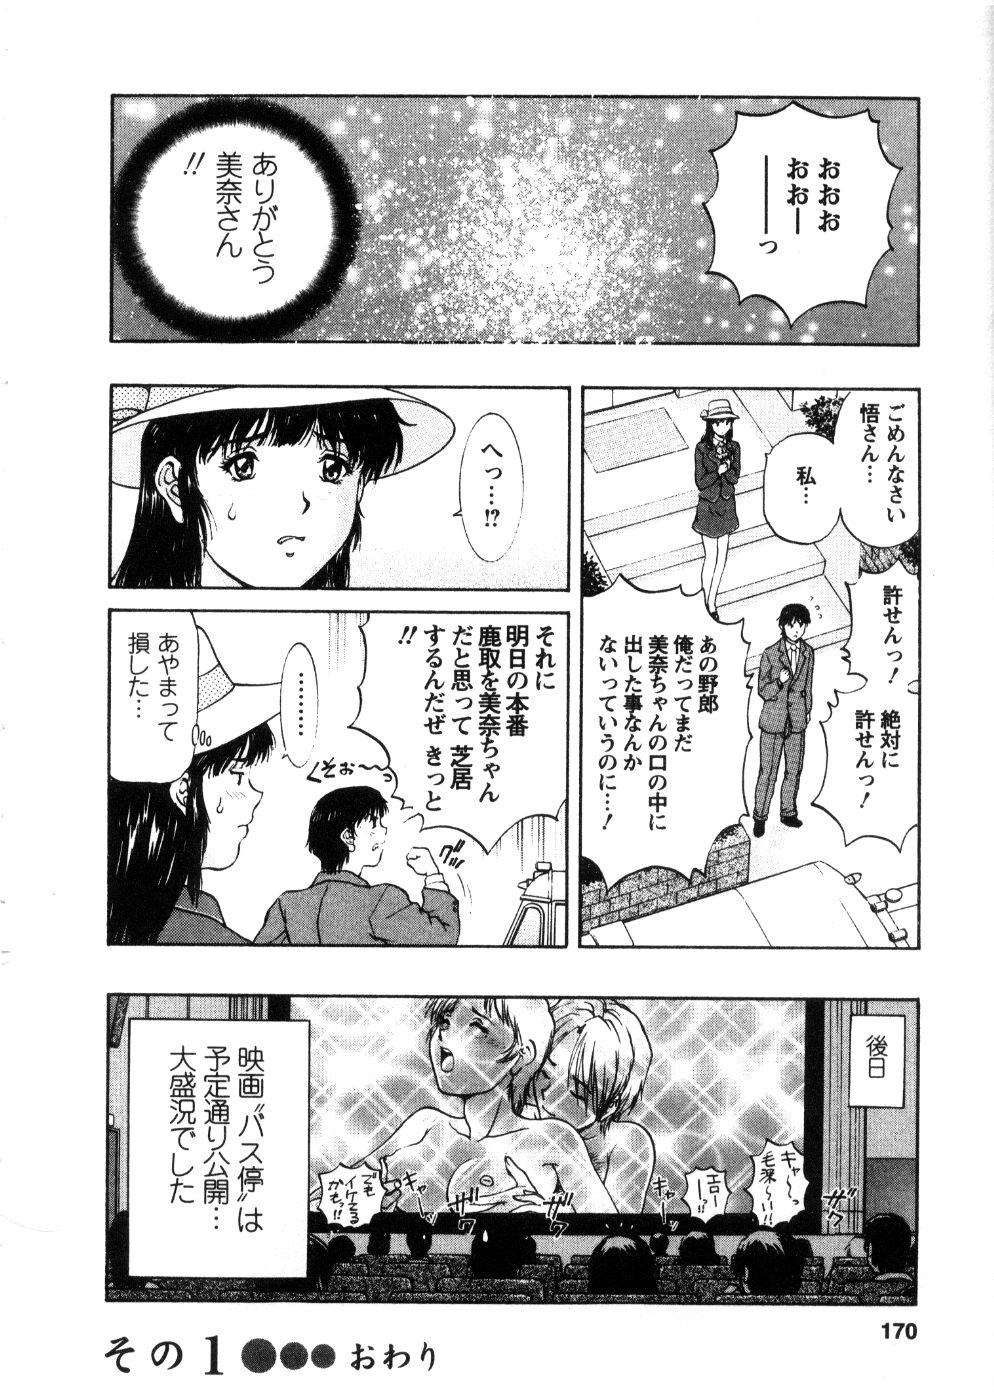 Oneechan-tachi ga Yatte Kuru 03 171